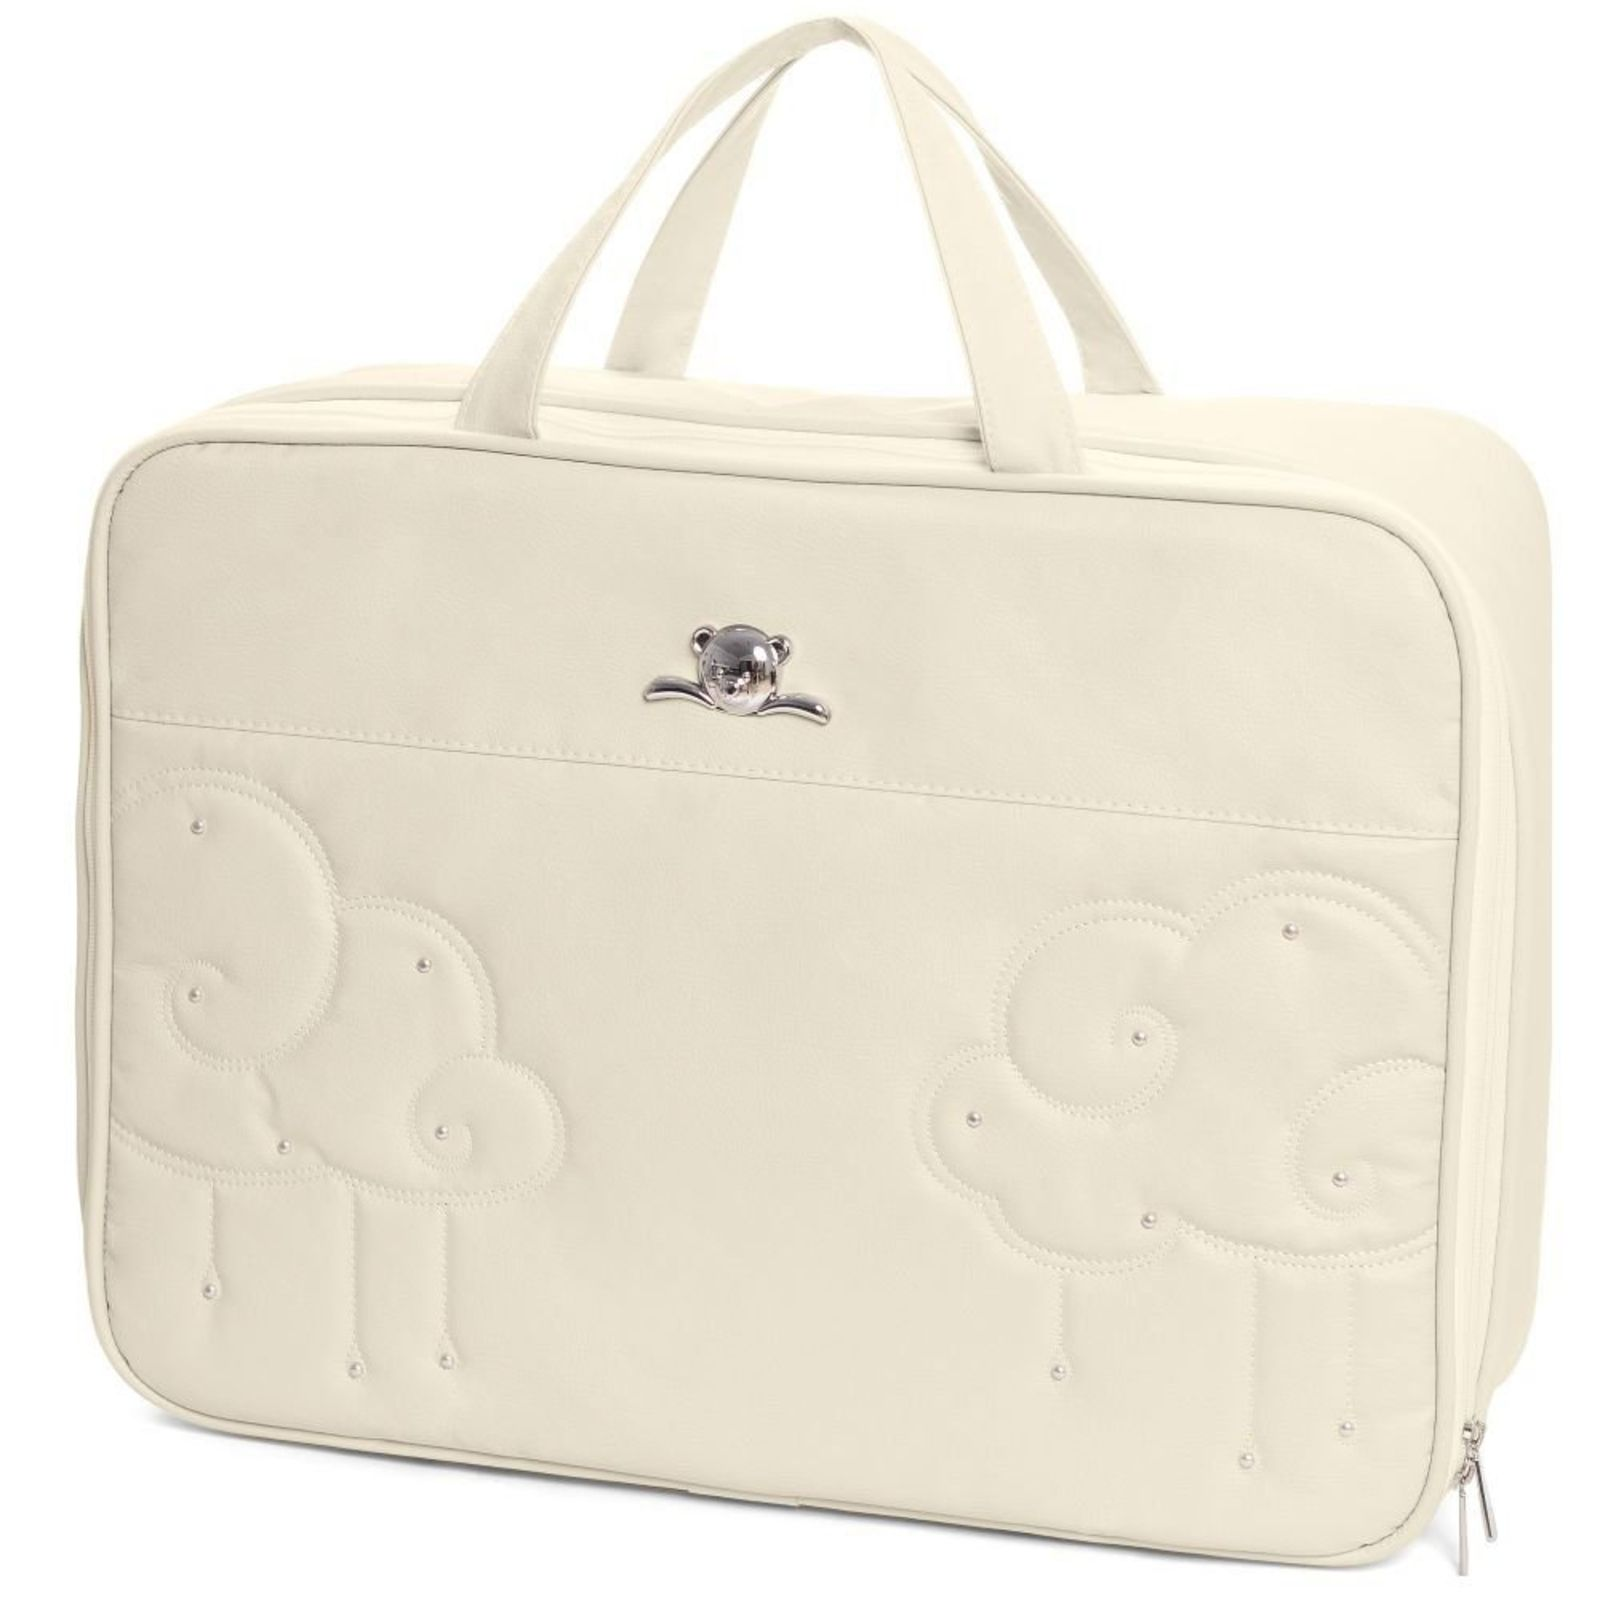 d6b0487e4bd0c Mala Maternidade Hug Baby Nuvem Bege   Products   Pinterest